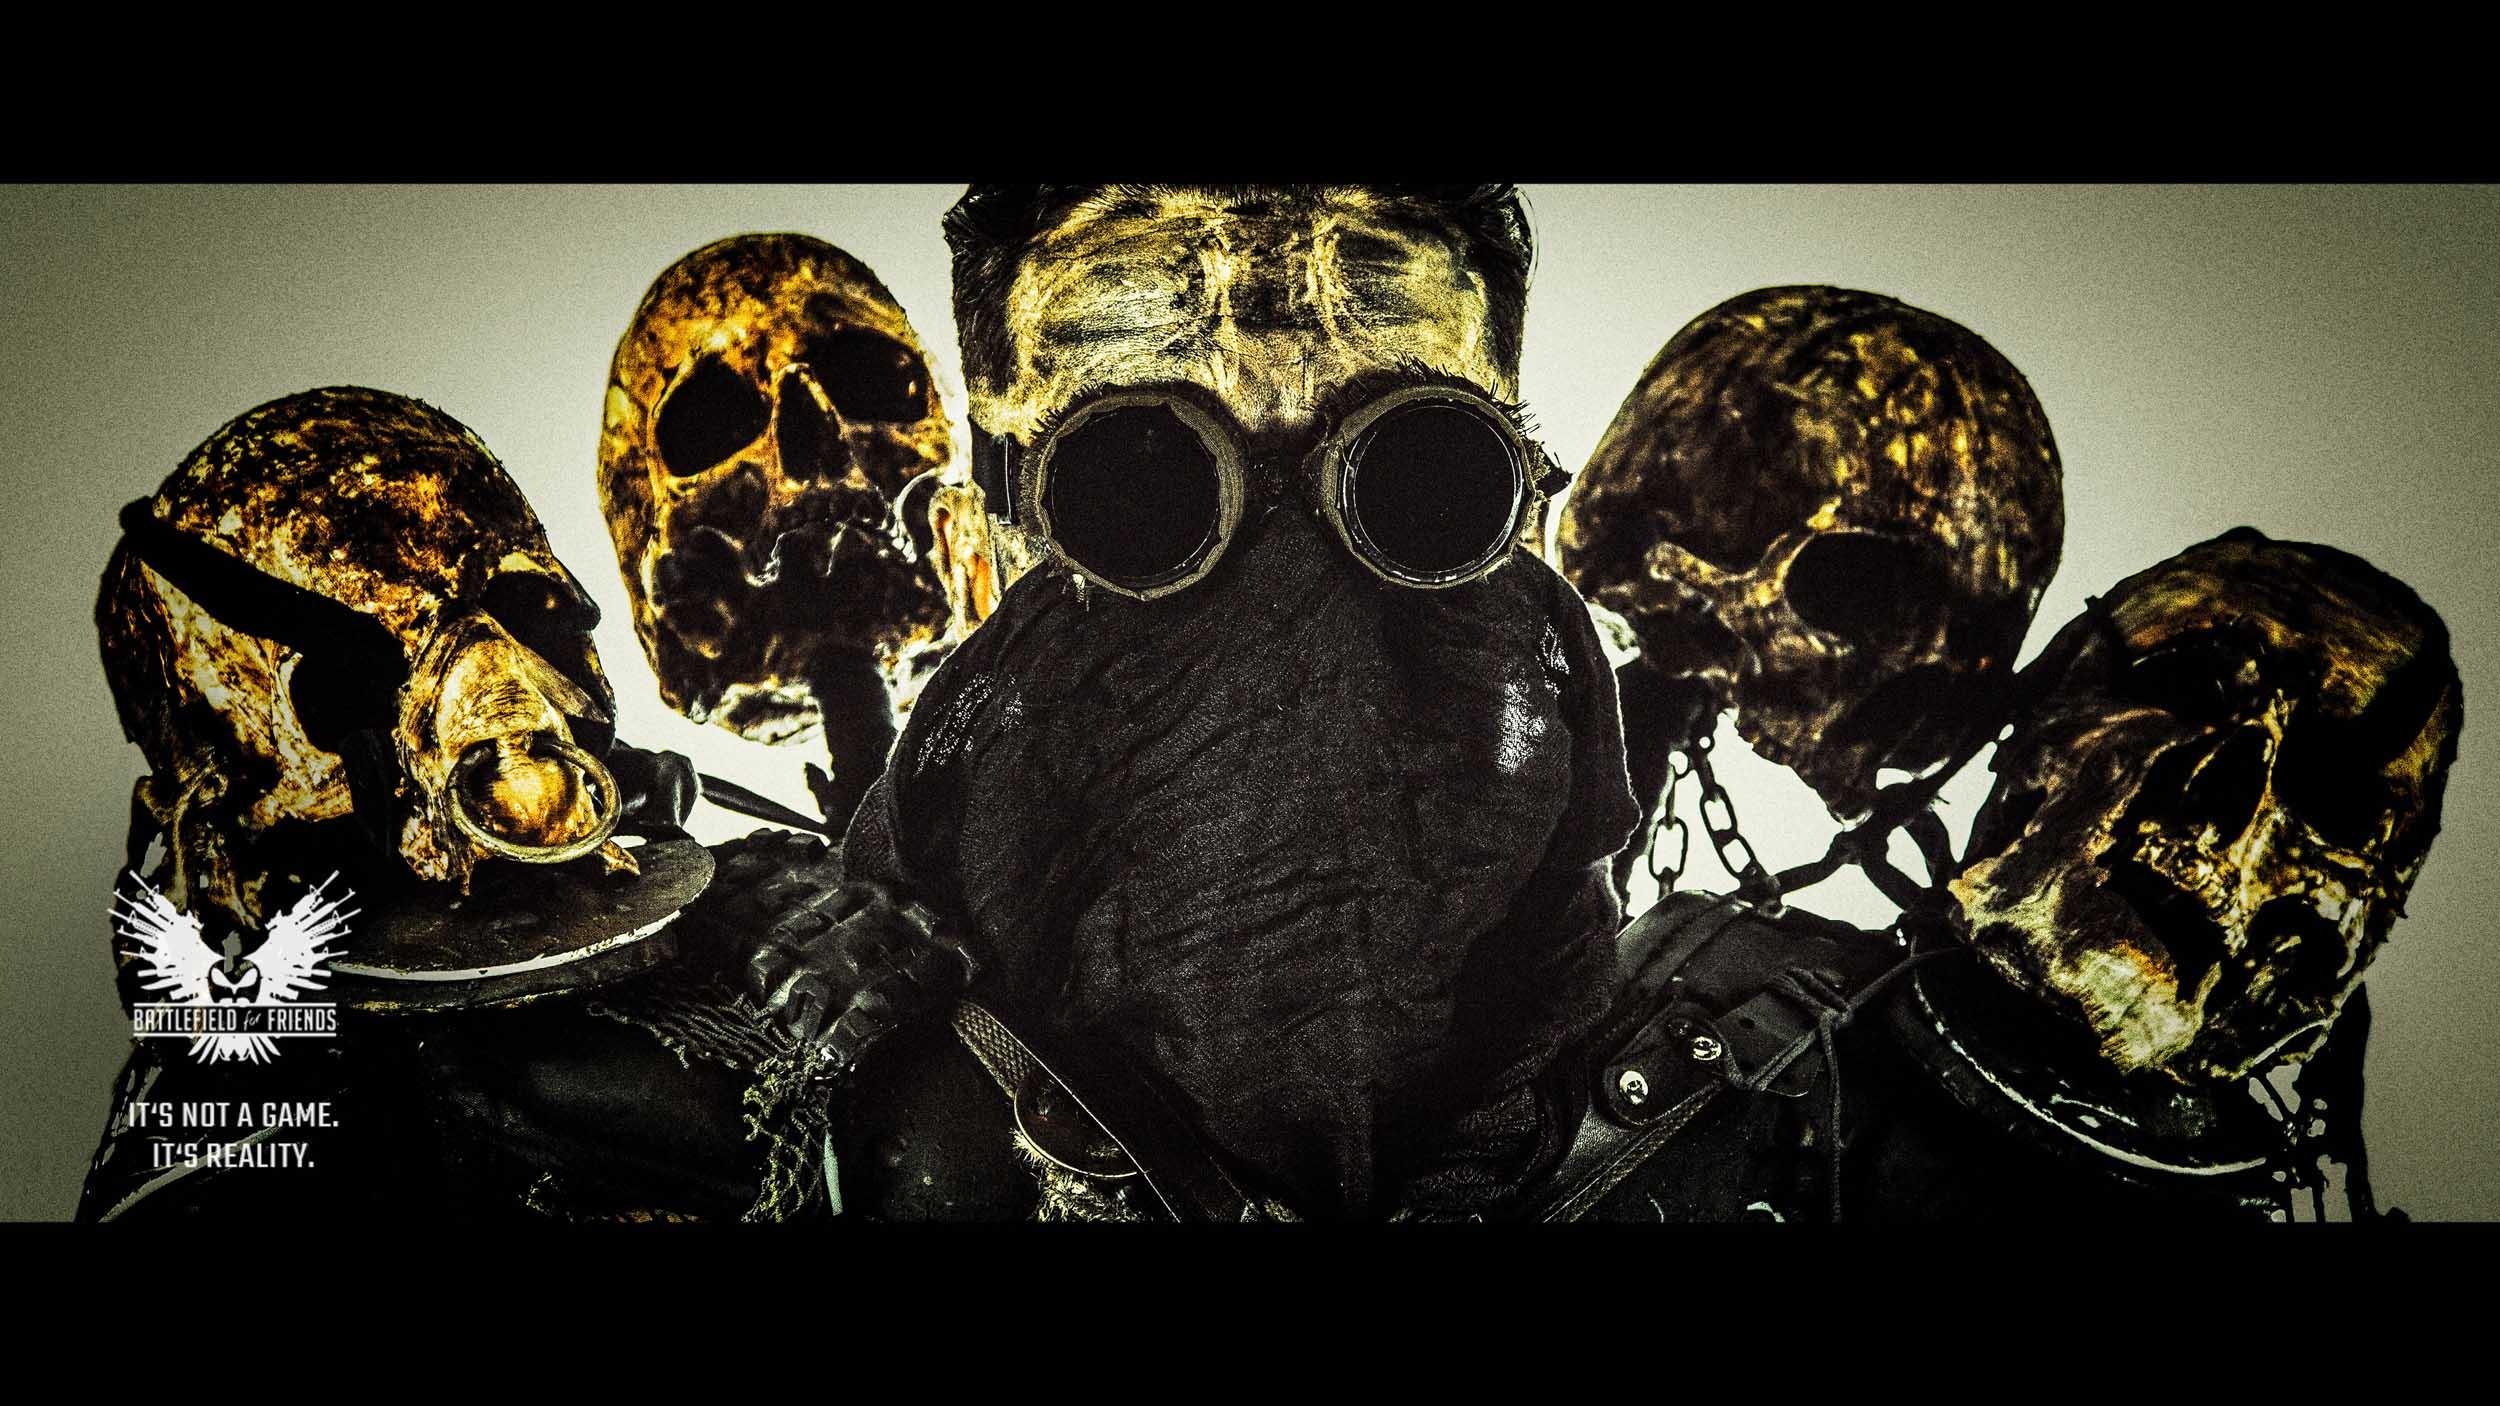 Post apocalyptic survivor with skulls